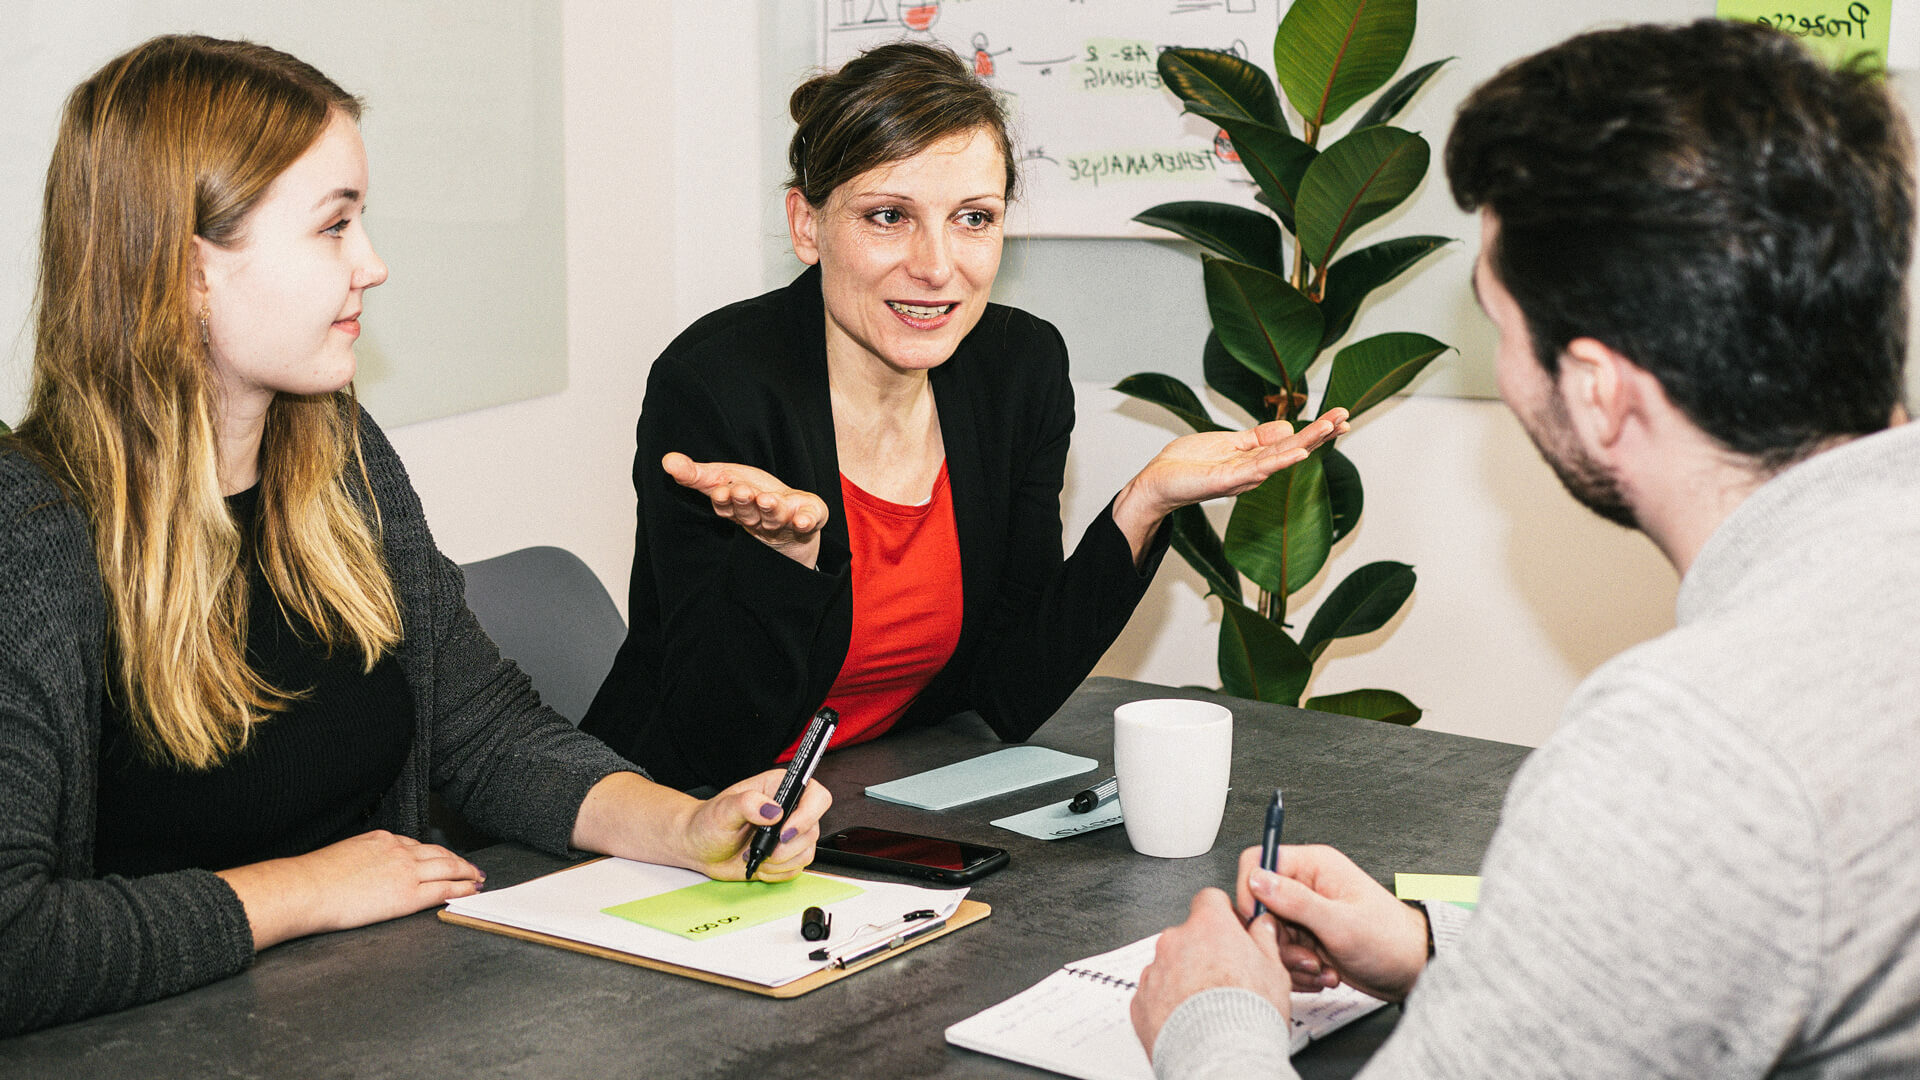 Coaching Teamentwicklung Führungskräfteentwicklung Organisationsentwicklung Teamentwicklung Kommunication Beratung Moderation Training